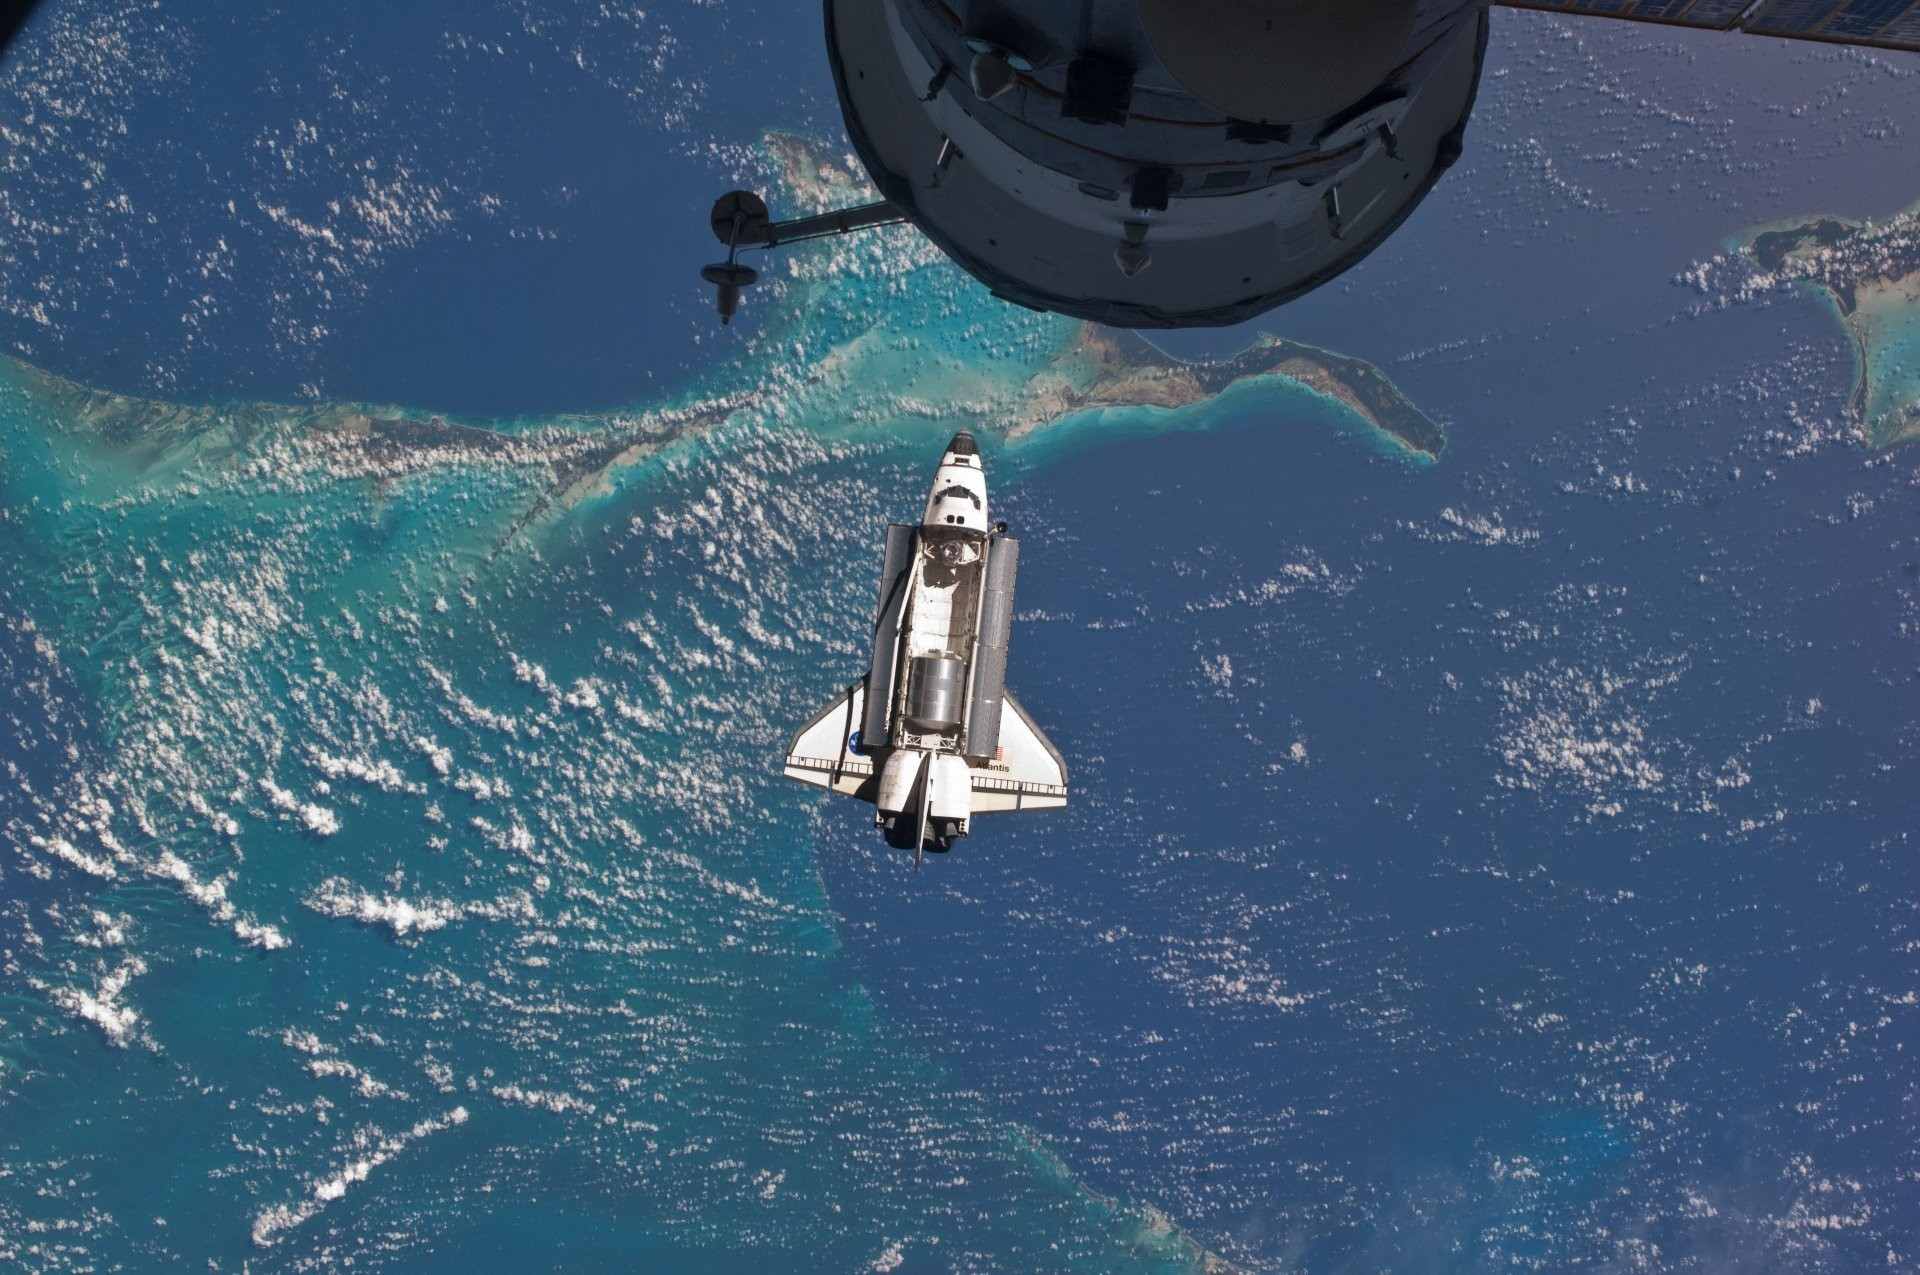 space shuttle atlantis last flight nasa iss international space station  atlantis space